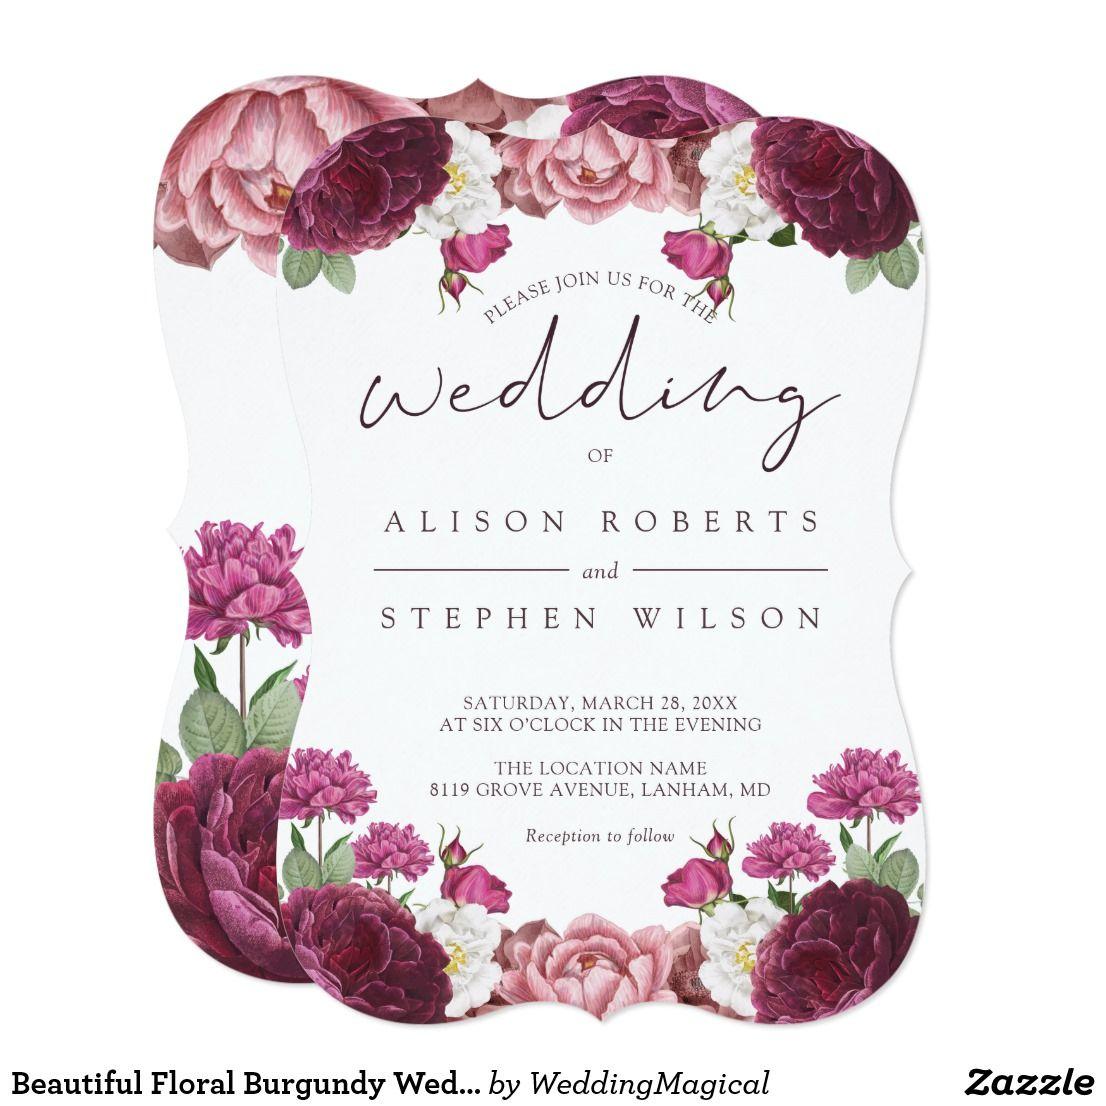 Beautiful Floral Burgundy Wedding Invitation